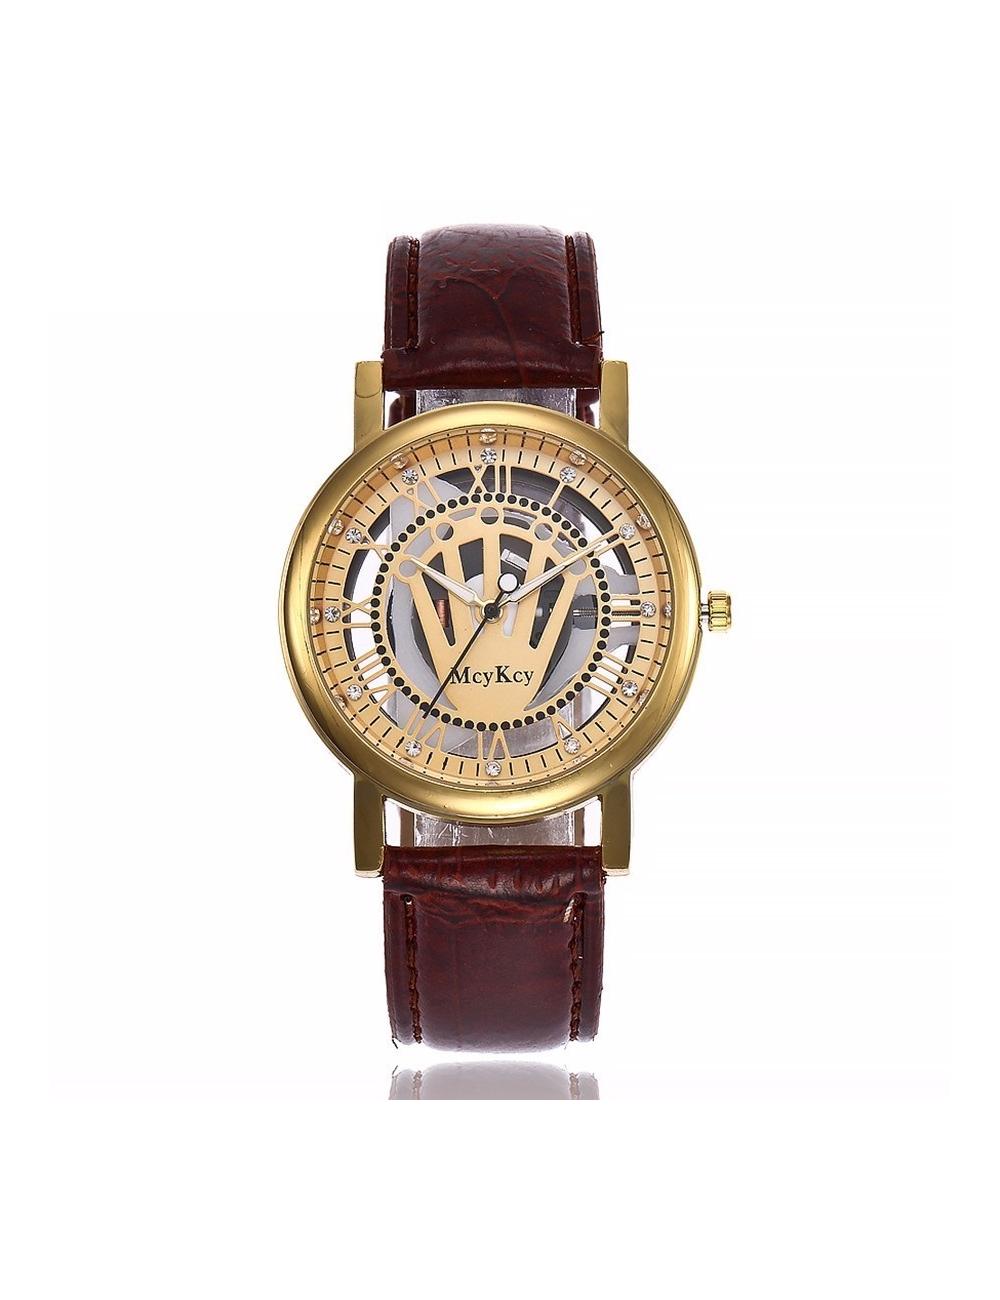 Reloj Corona Dayoshop 39,900.00